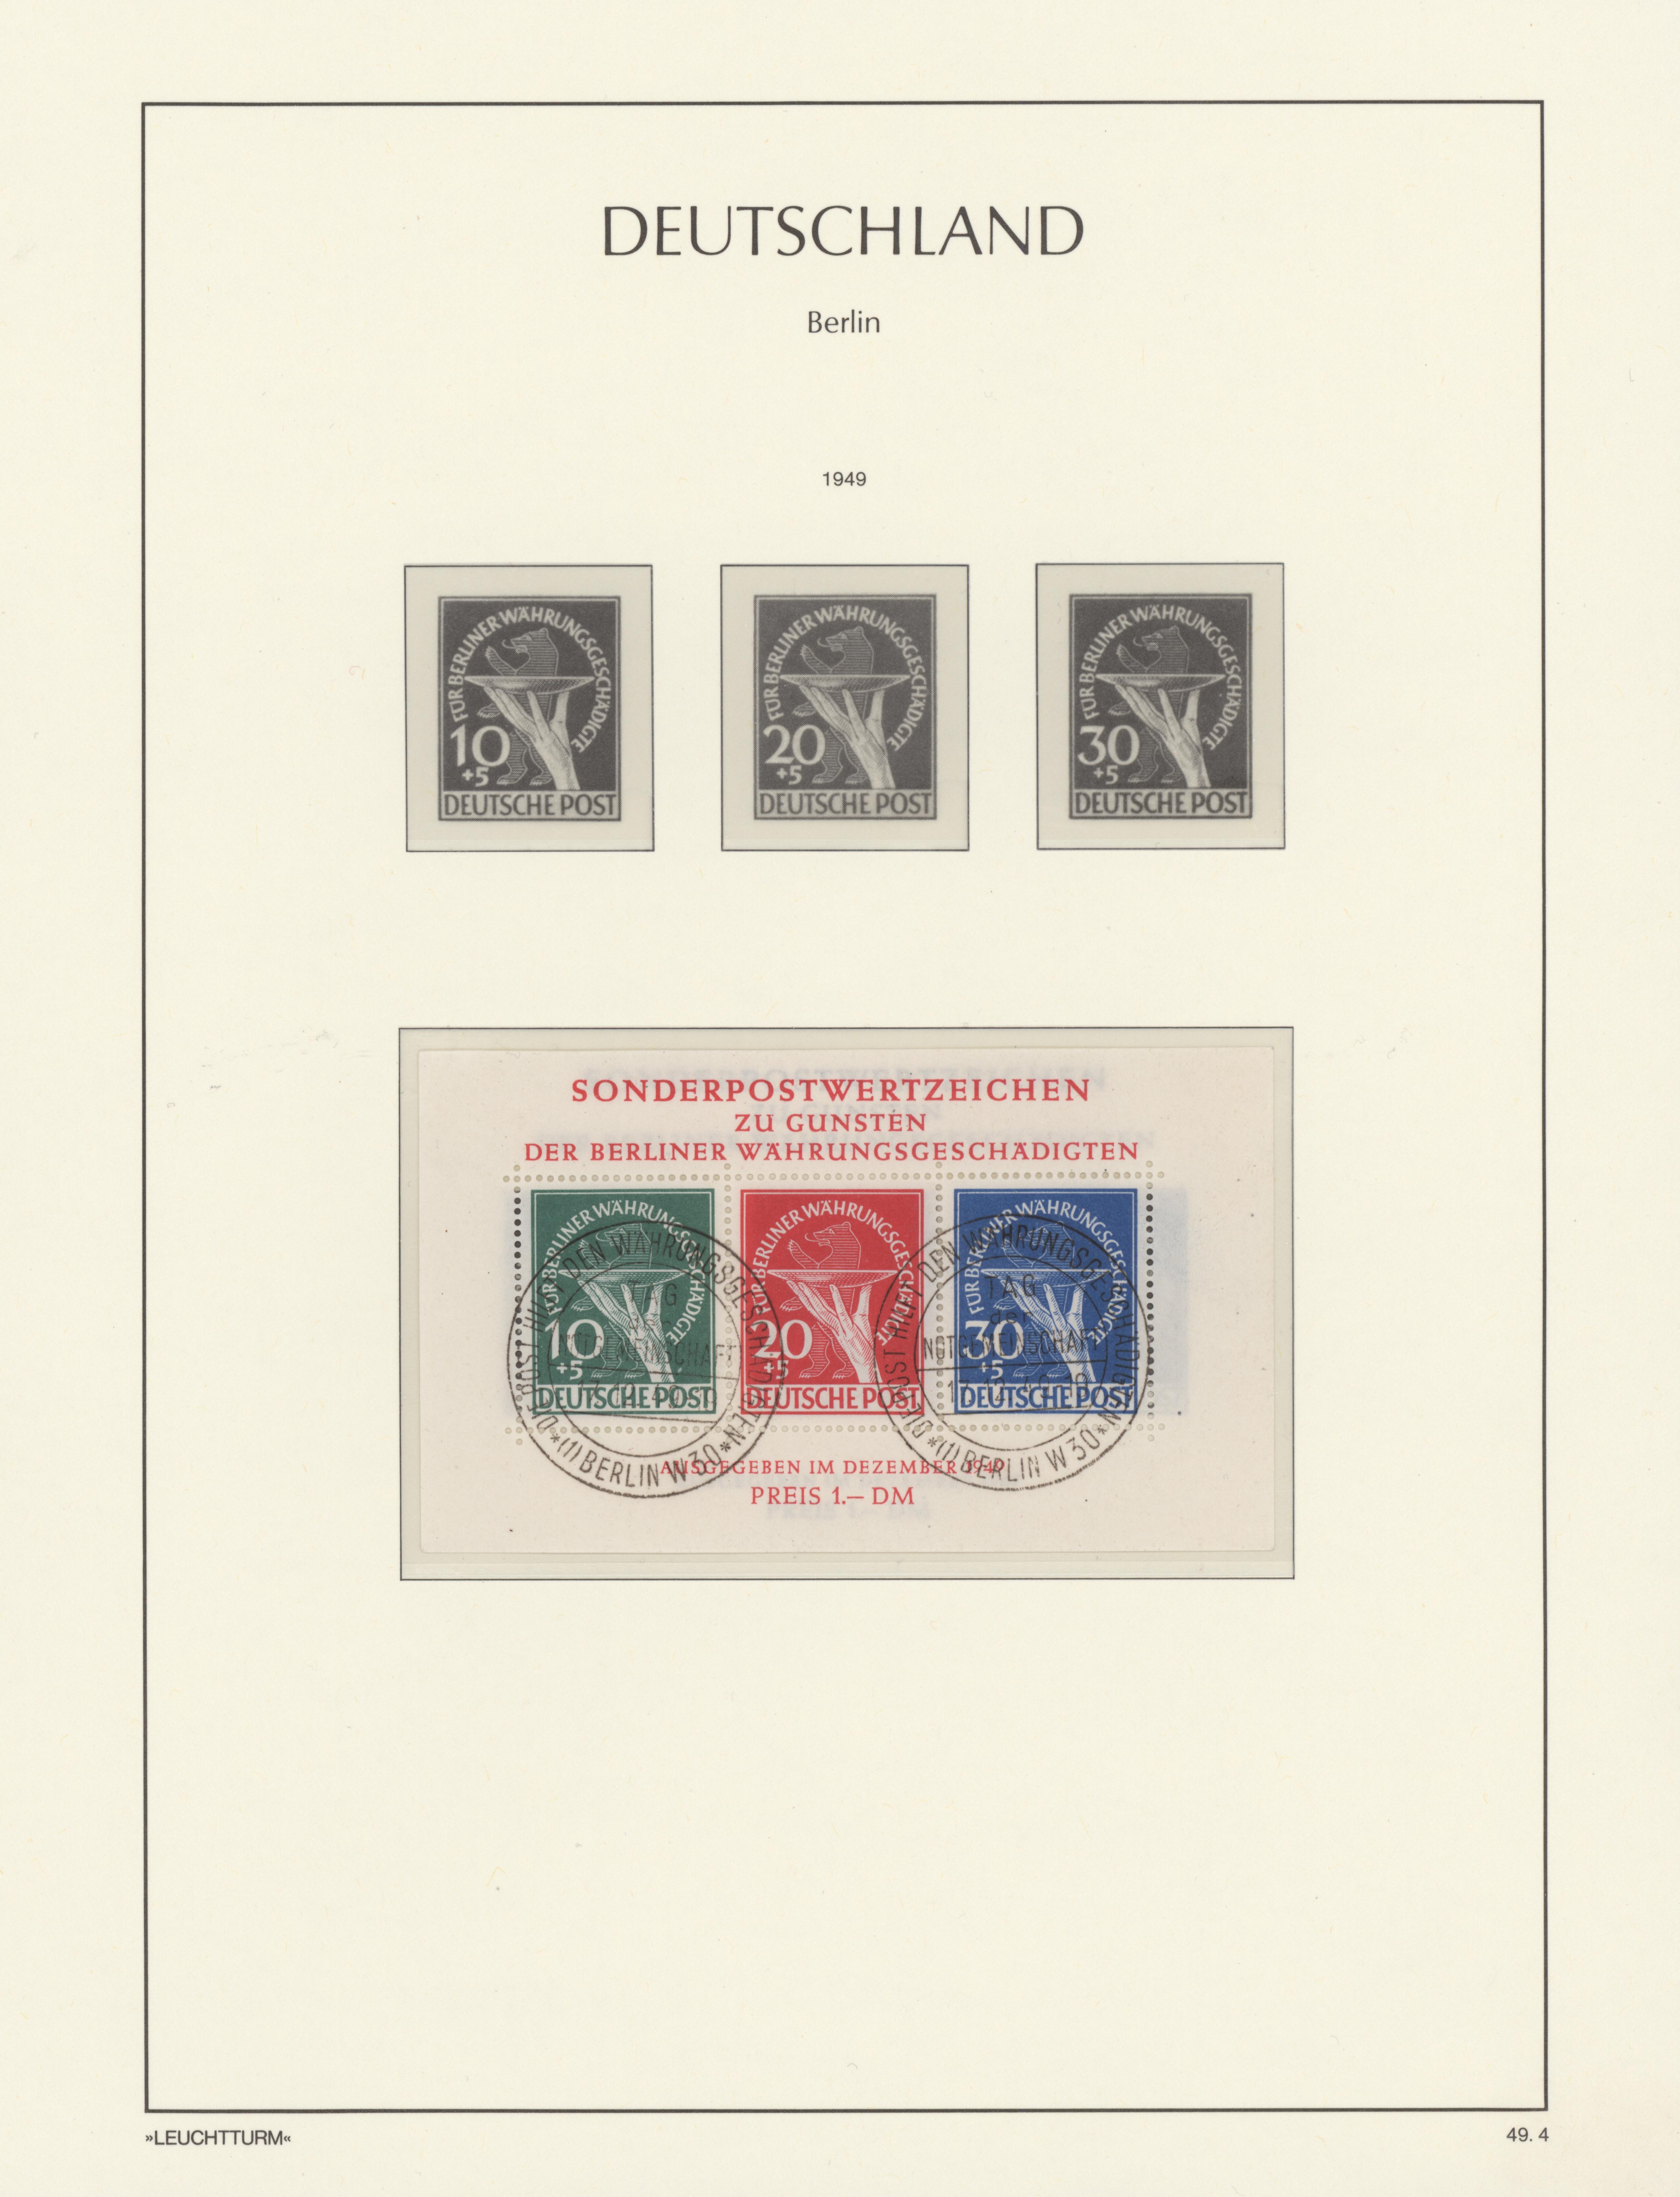 Lot 22000 - nachlässe  -  Auktionshaus Christoph Gärtner GmbH & Co. KG Sale #49 Collections Overseas, Thematics, Europe, Germany/Estates